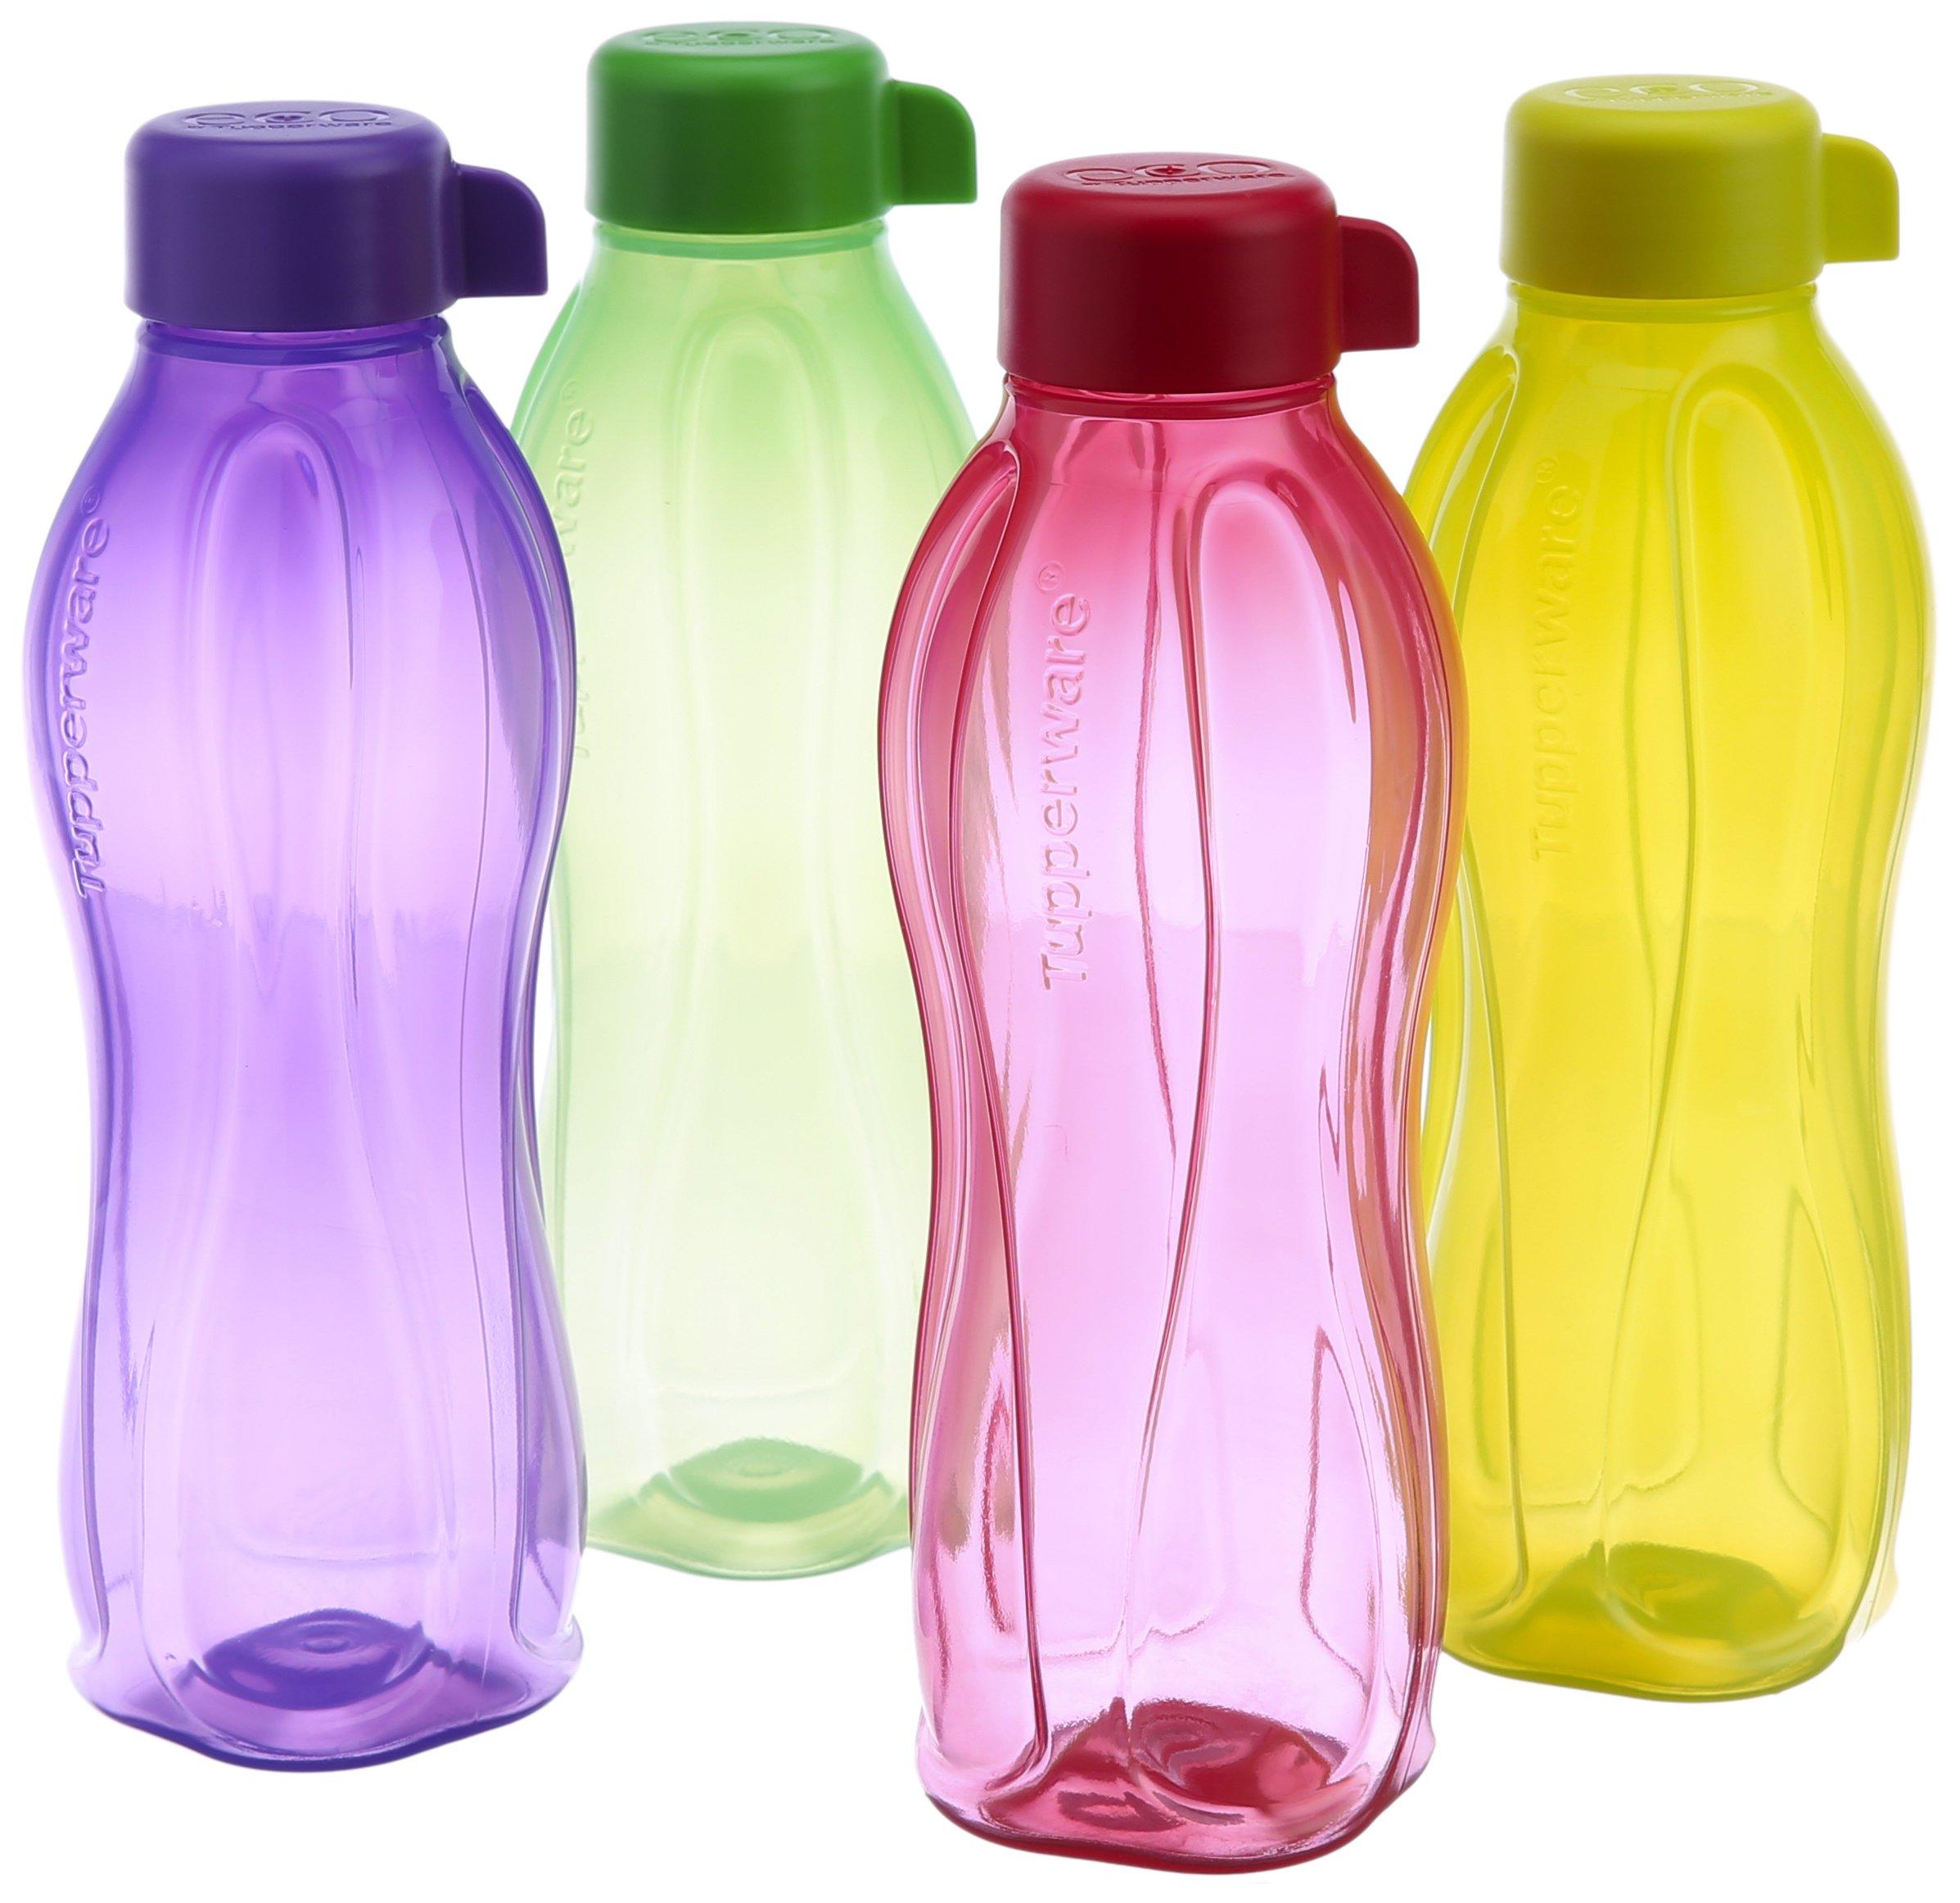 Tupperware Aquasafe Water Bottle Set, 500ml, Set of 4 (B.5L) Colors May Vary